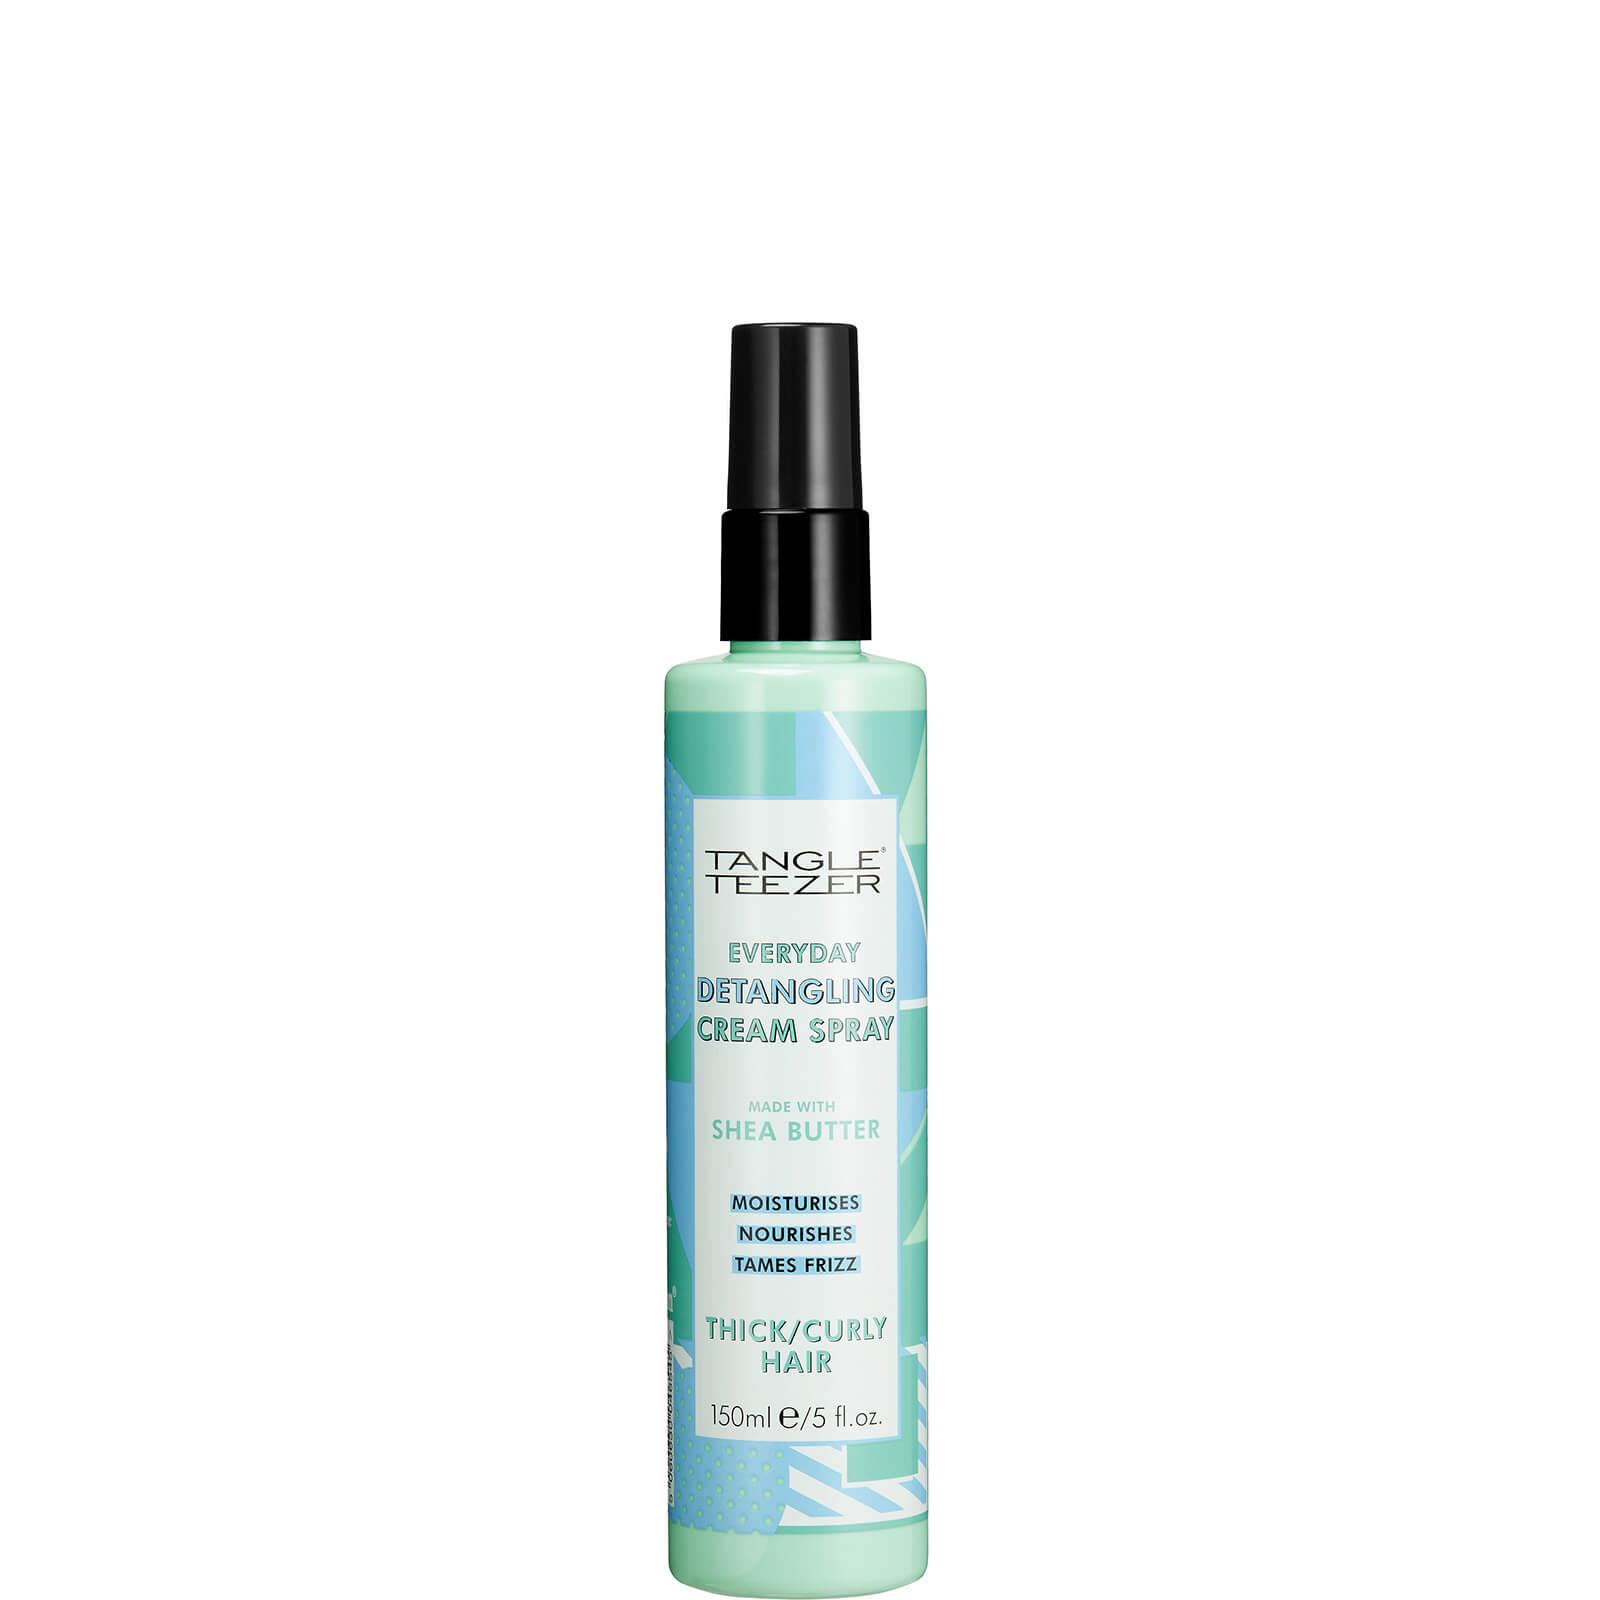 Купить Tangle Teezer Everyday Detangling Spray for Thick-Curly Hair 150ml